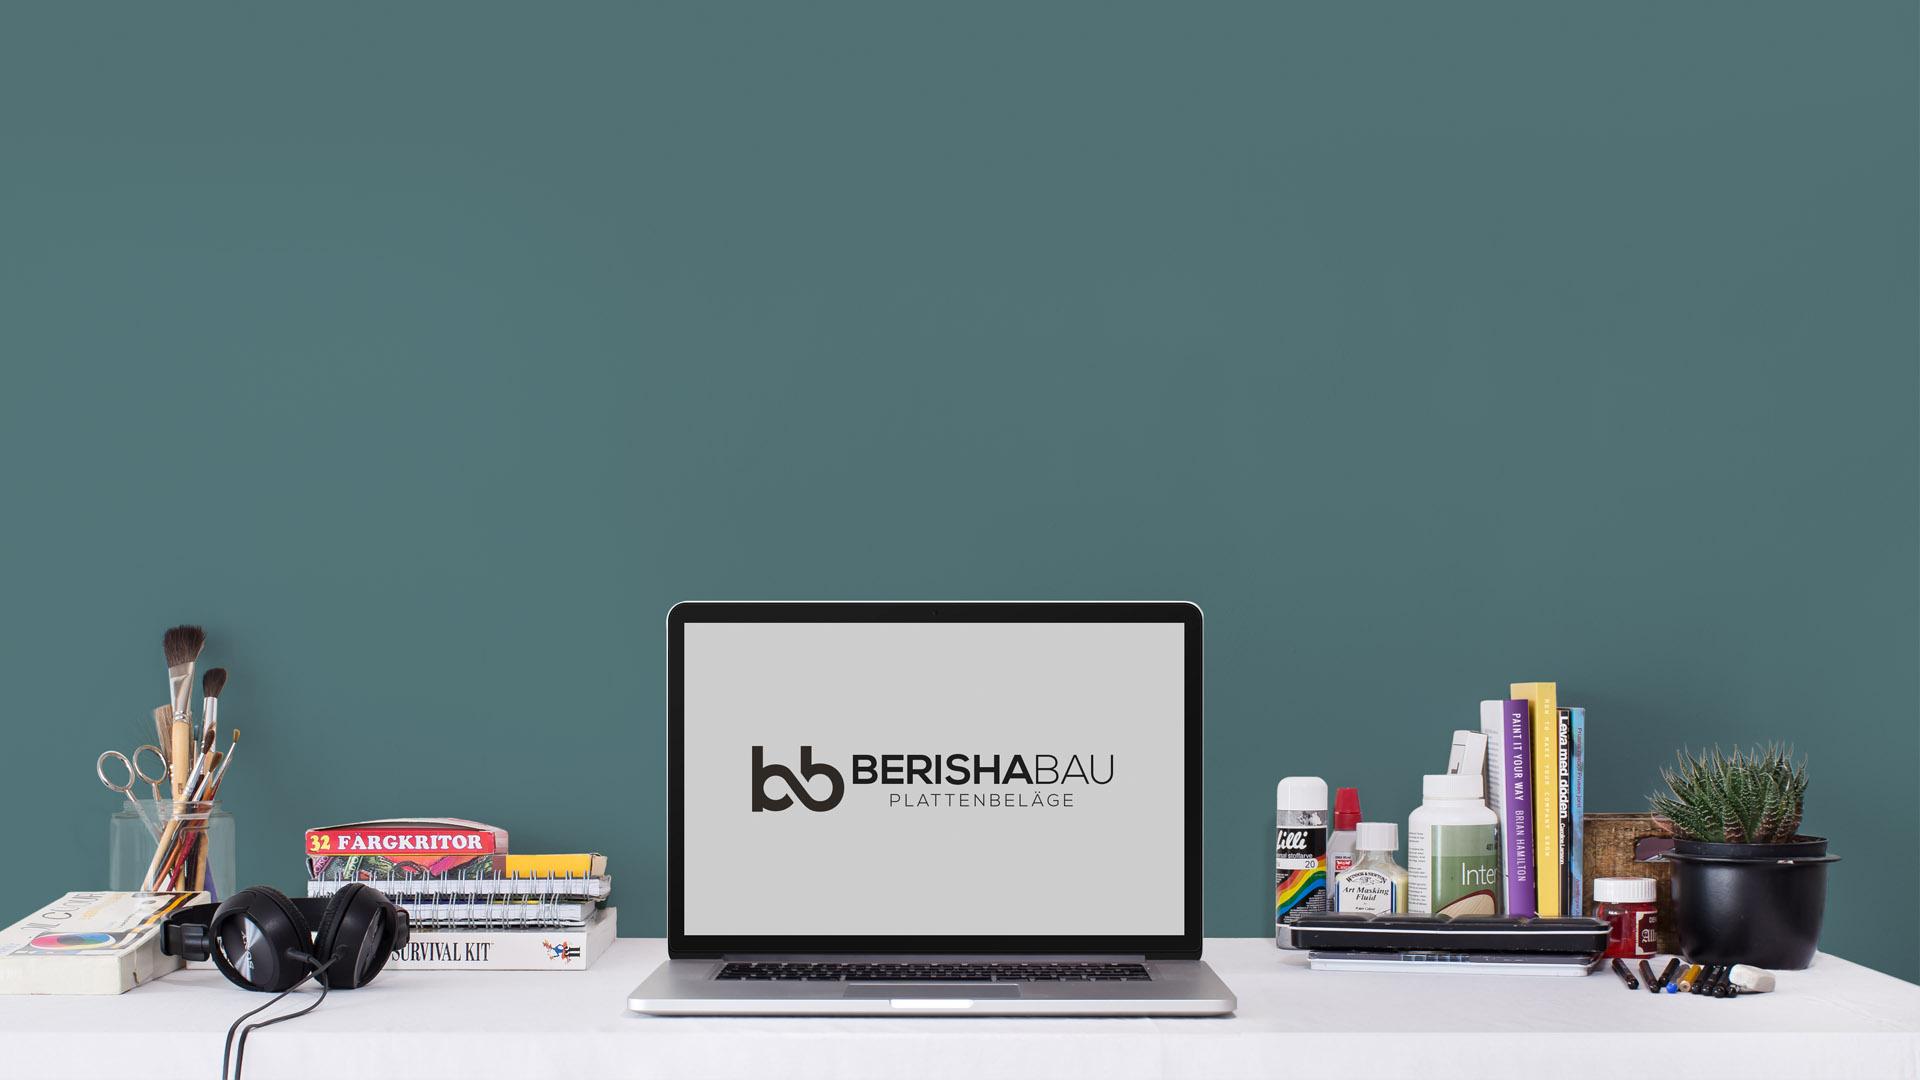 Berisha Bau